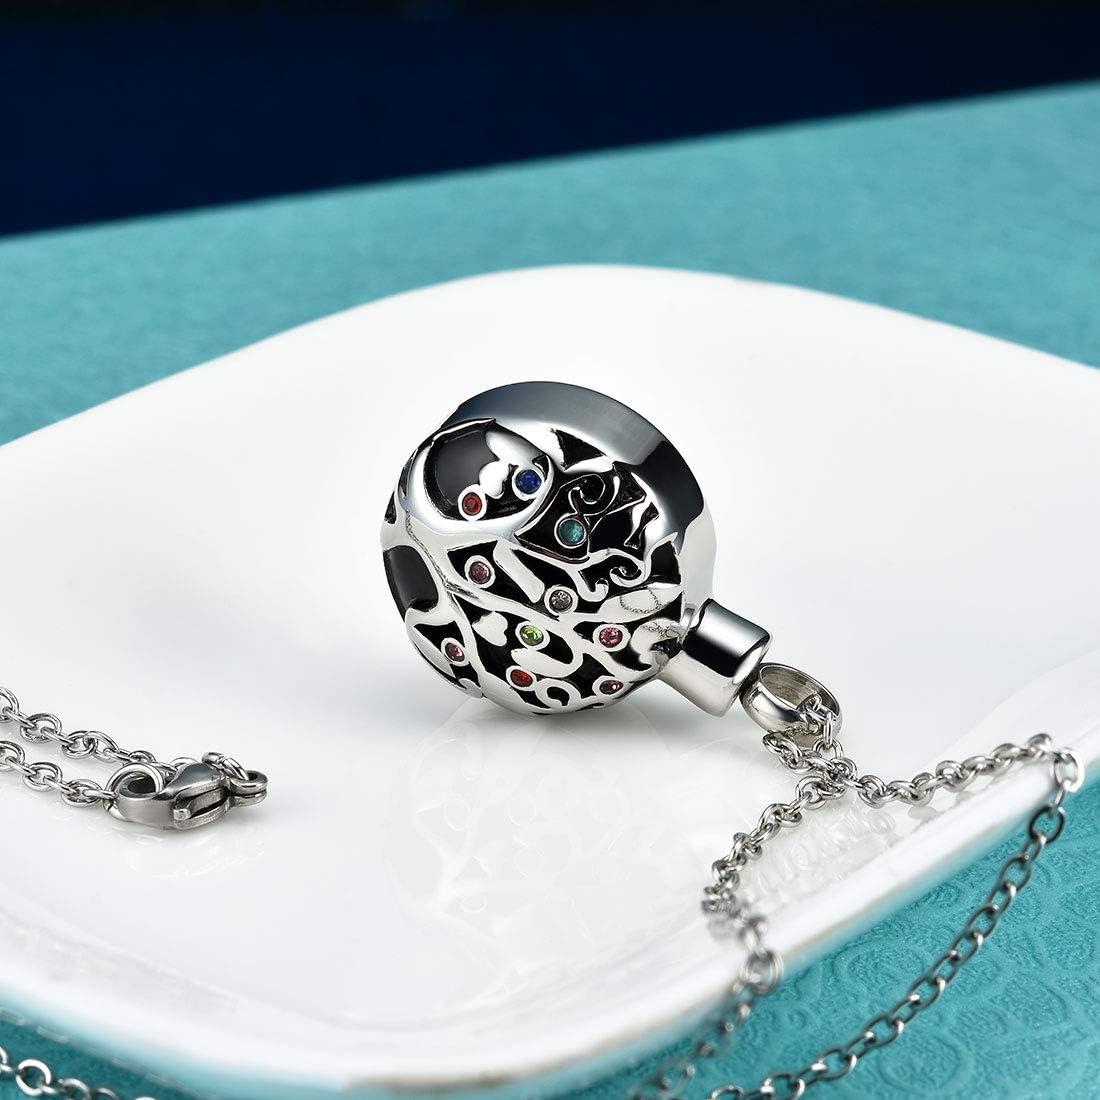 Cat Eye Jewels Memorial Cremation Urn Keepsake Ash Holder Heart Birthstone Pendant Necklace for Ashes for Men Women with Funnel Kit